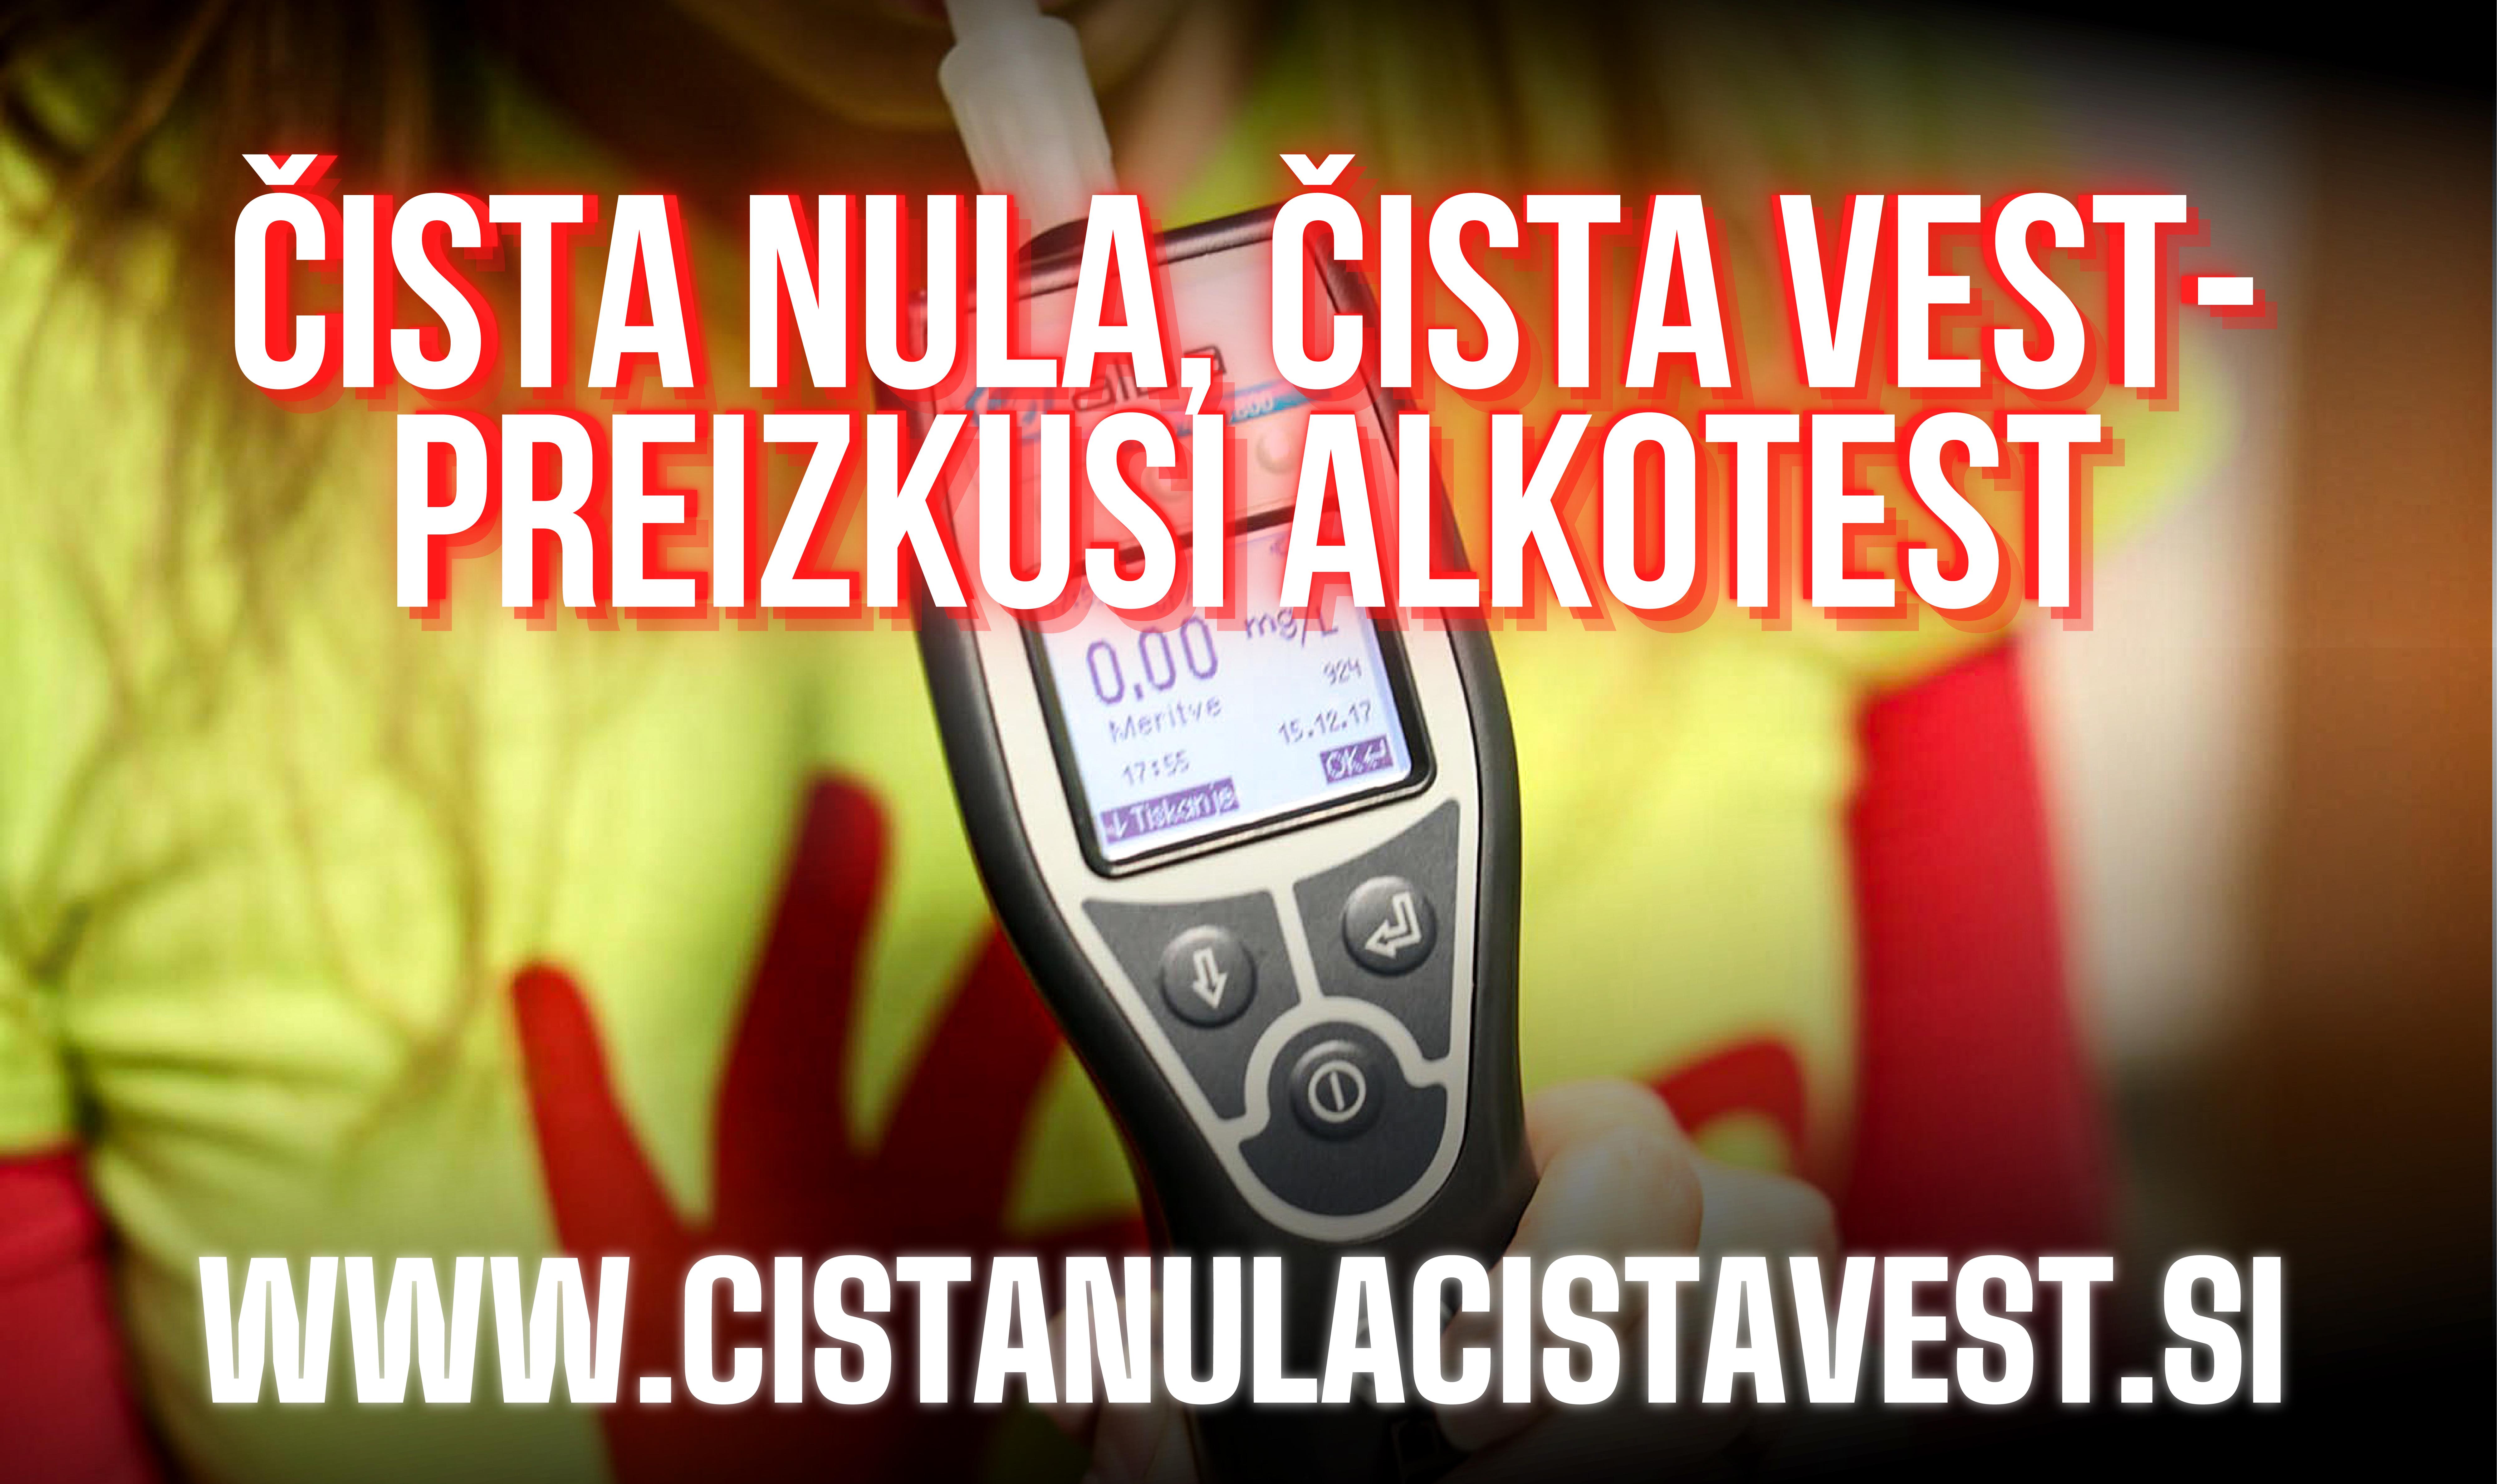 ZVP_CISTA NULA_web background+elements-2